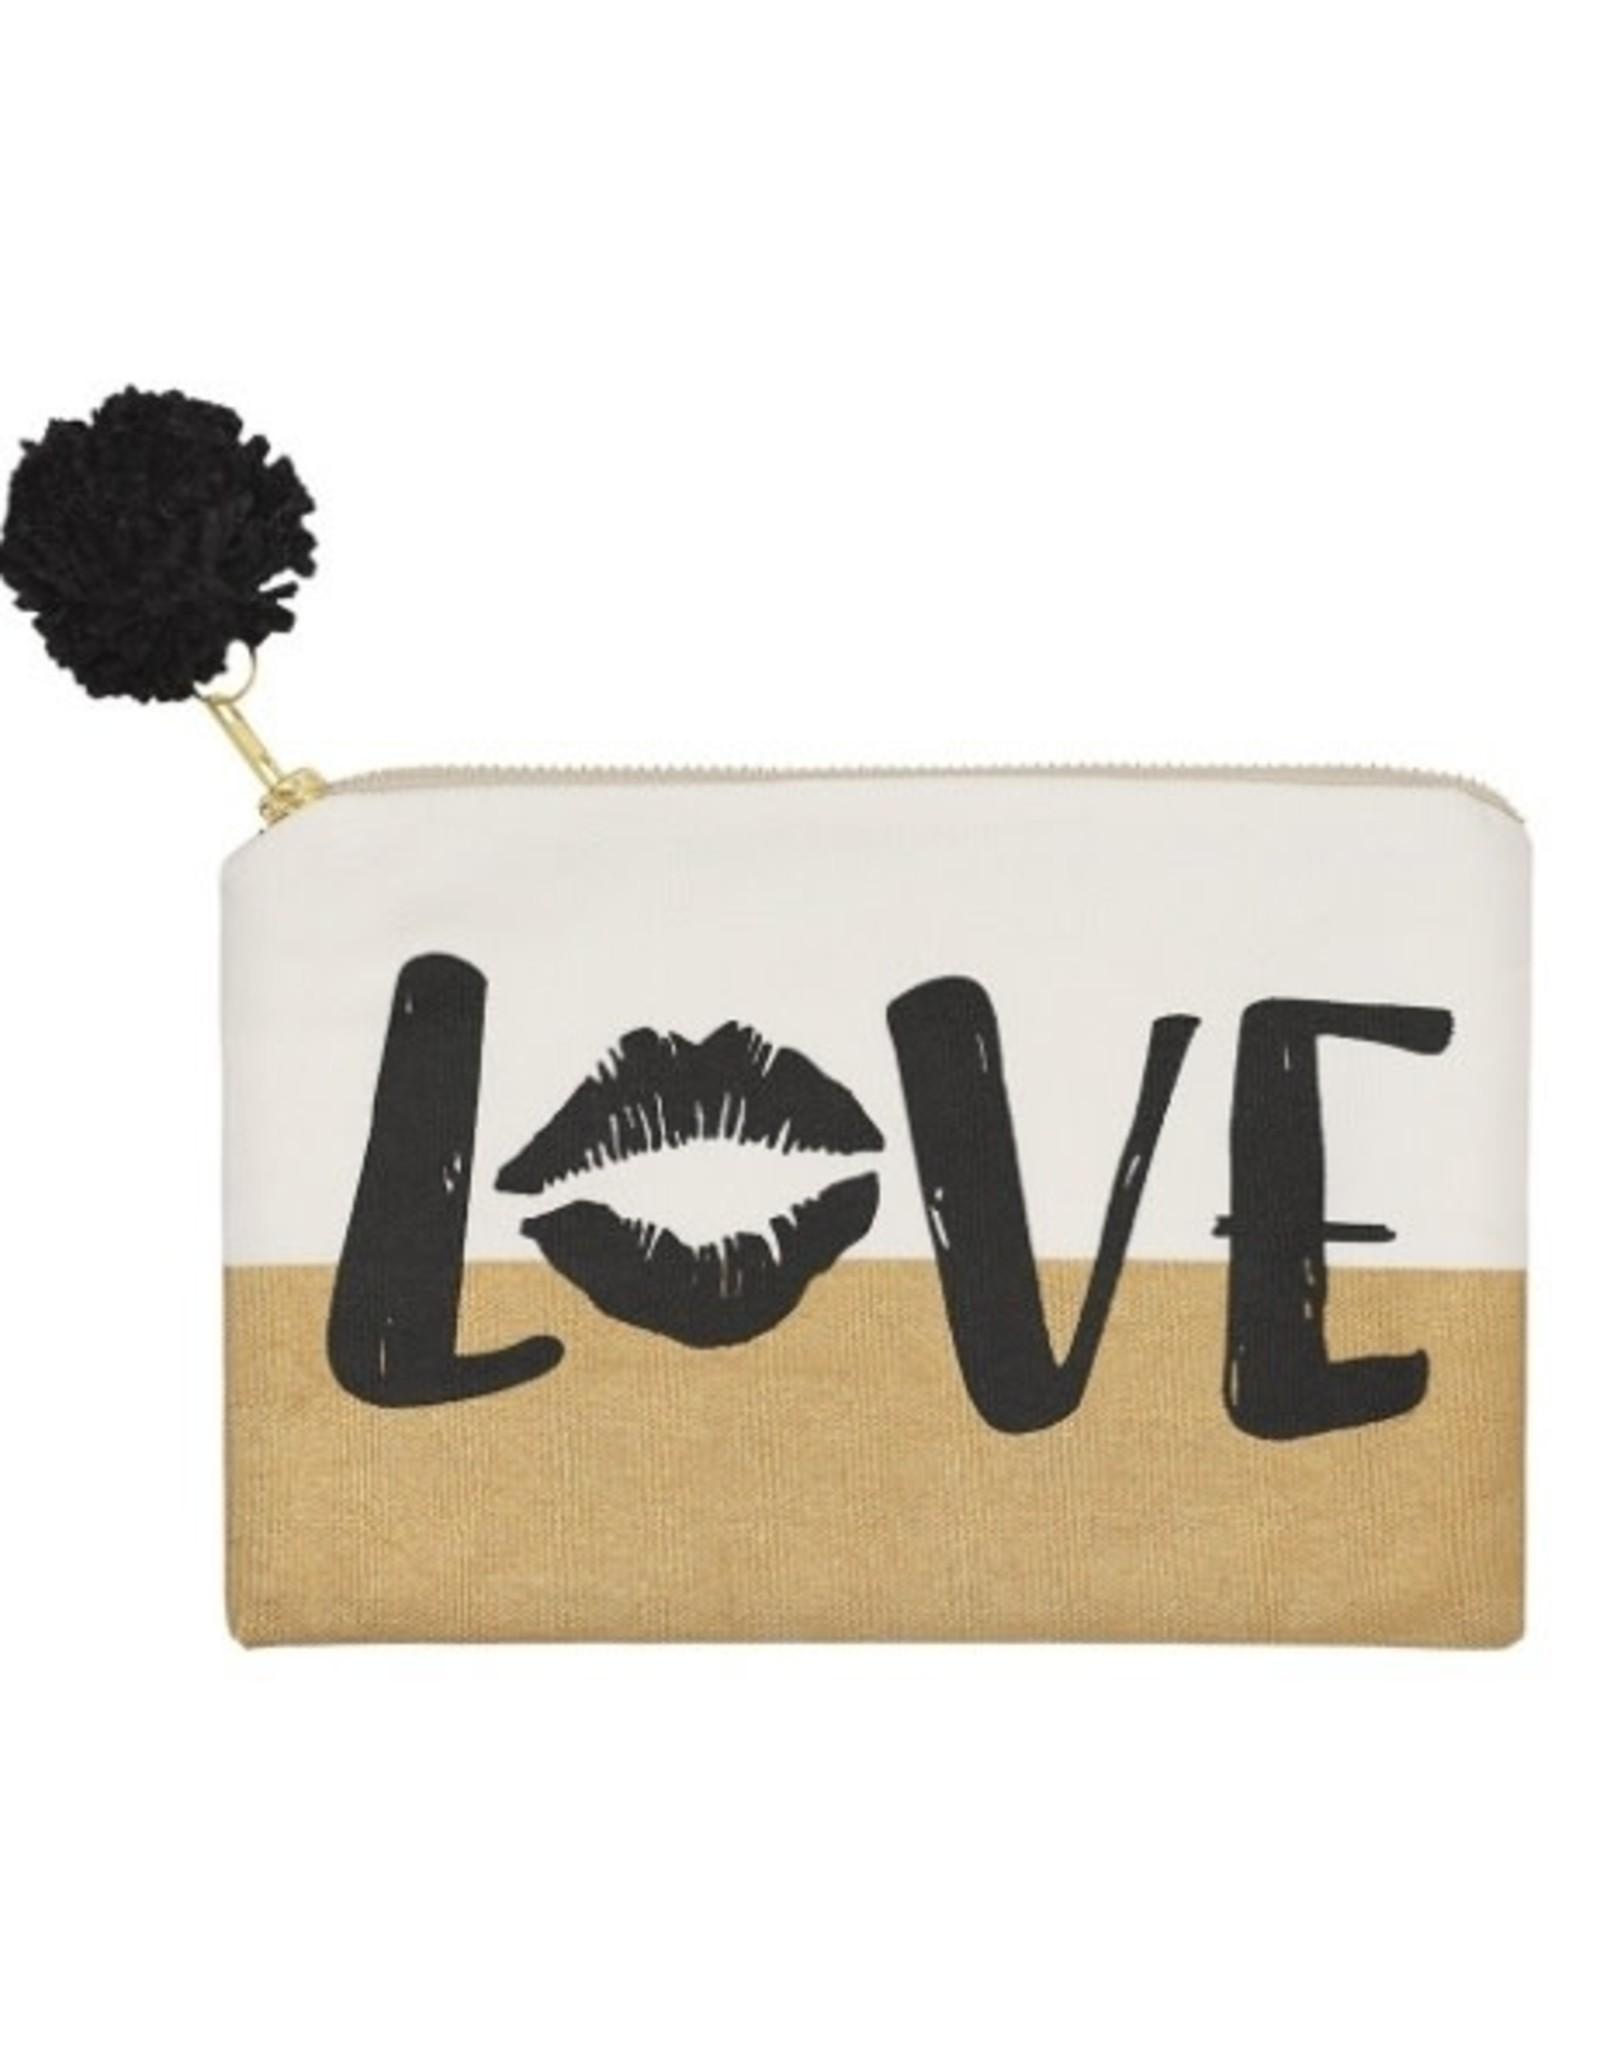 Mudpie Love Gold Dipped Cosmetic Bag